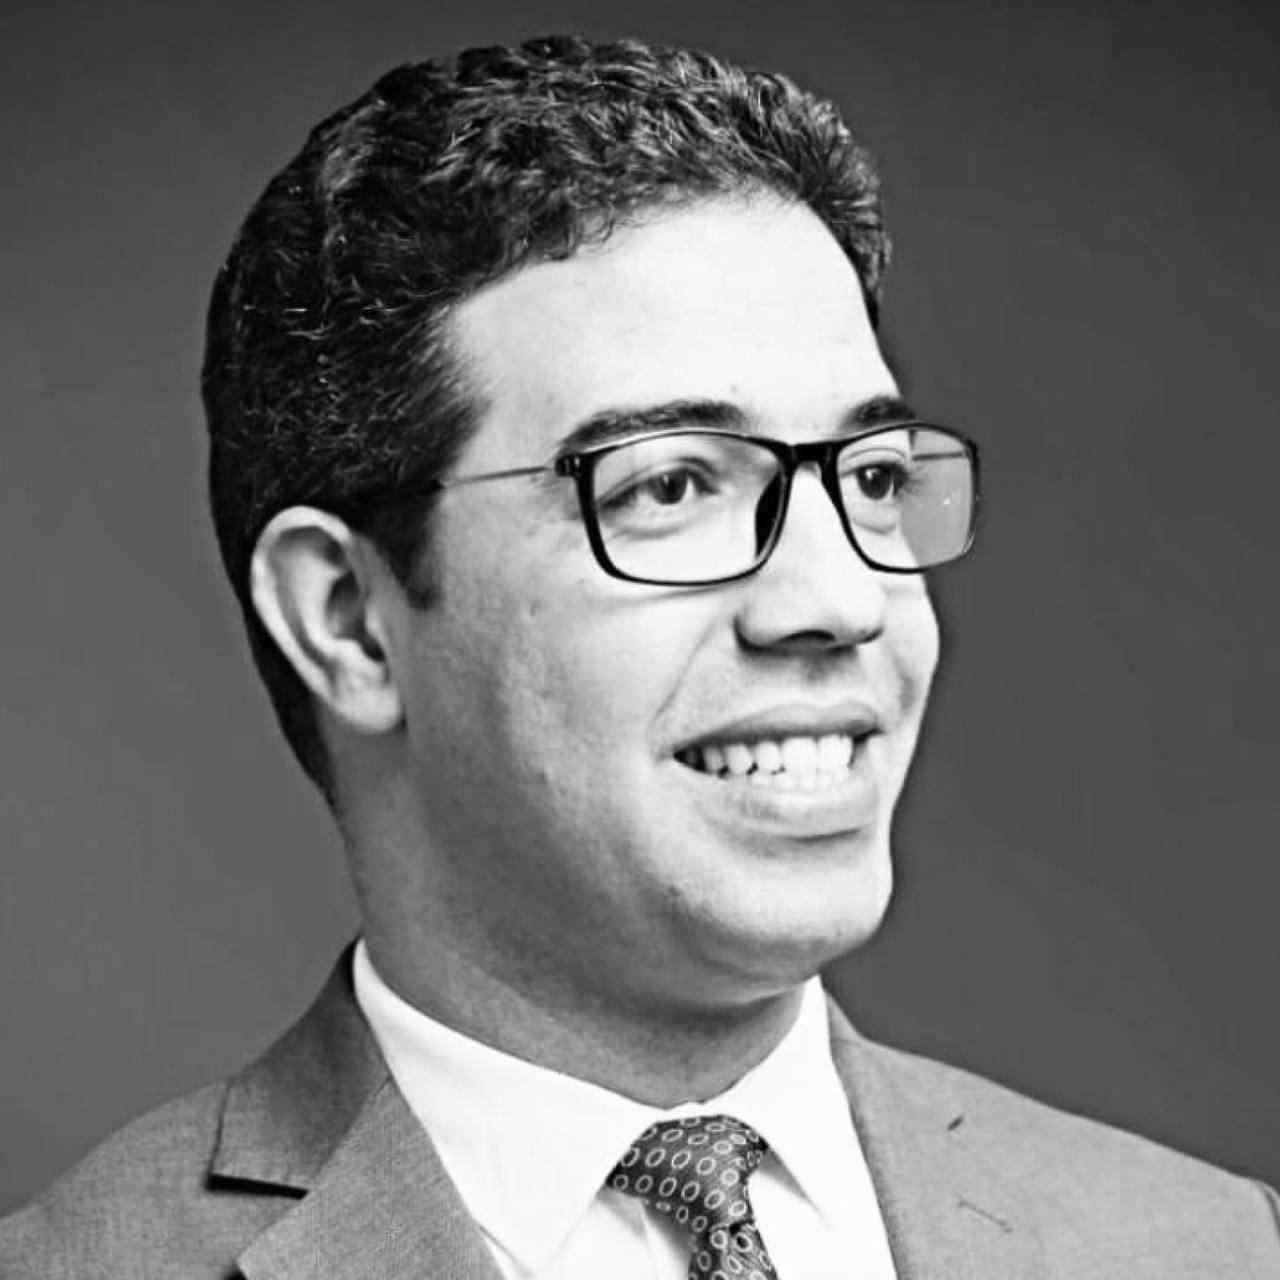 Ismail El Hamraoui